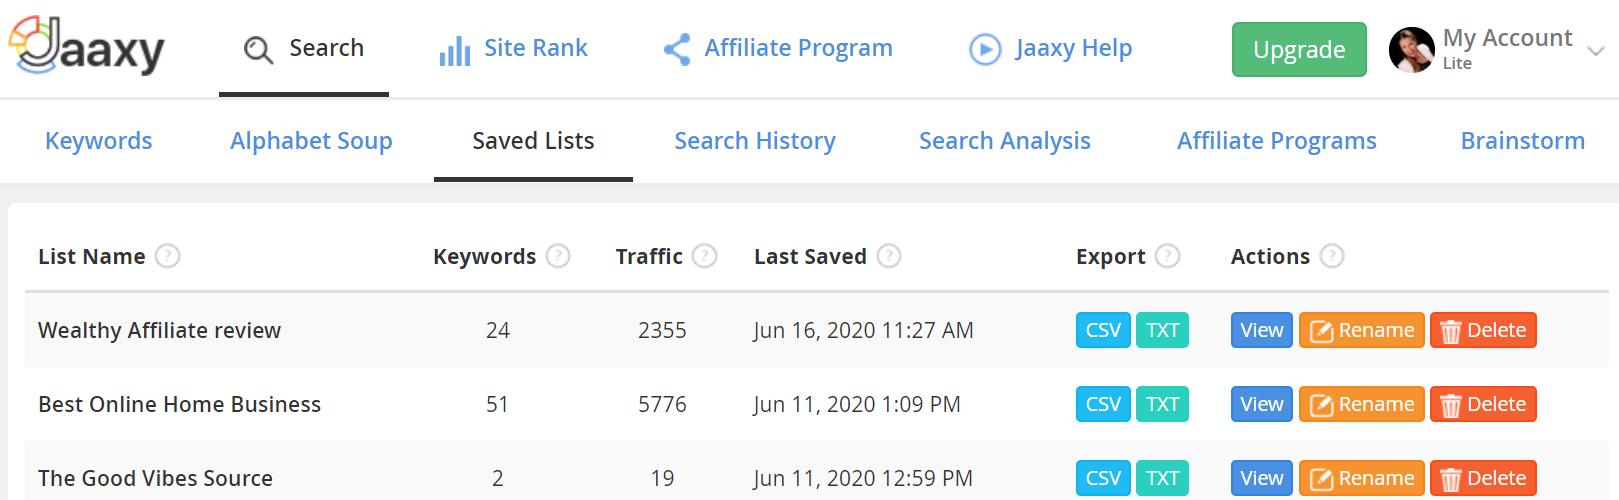 Jaaxy-Saved-Lists